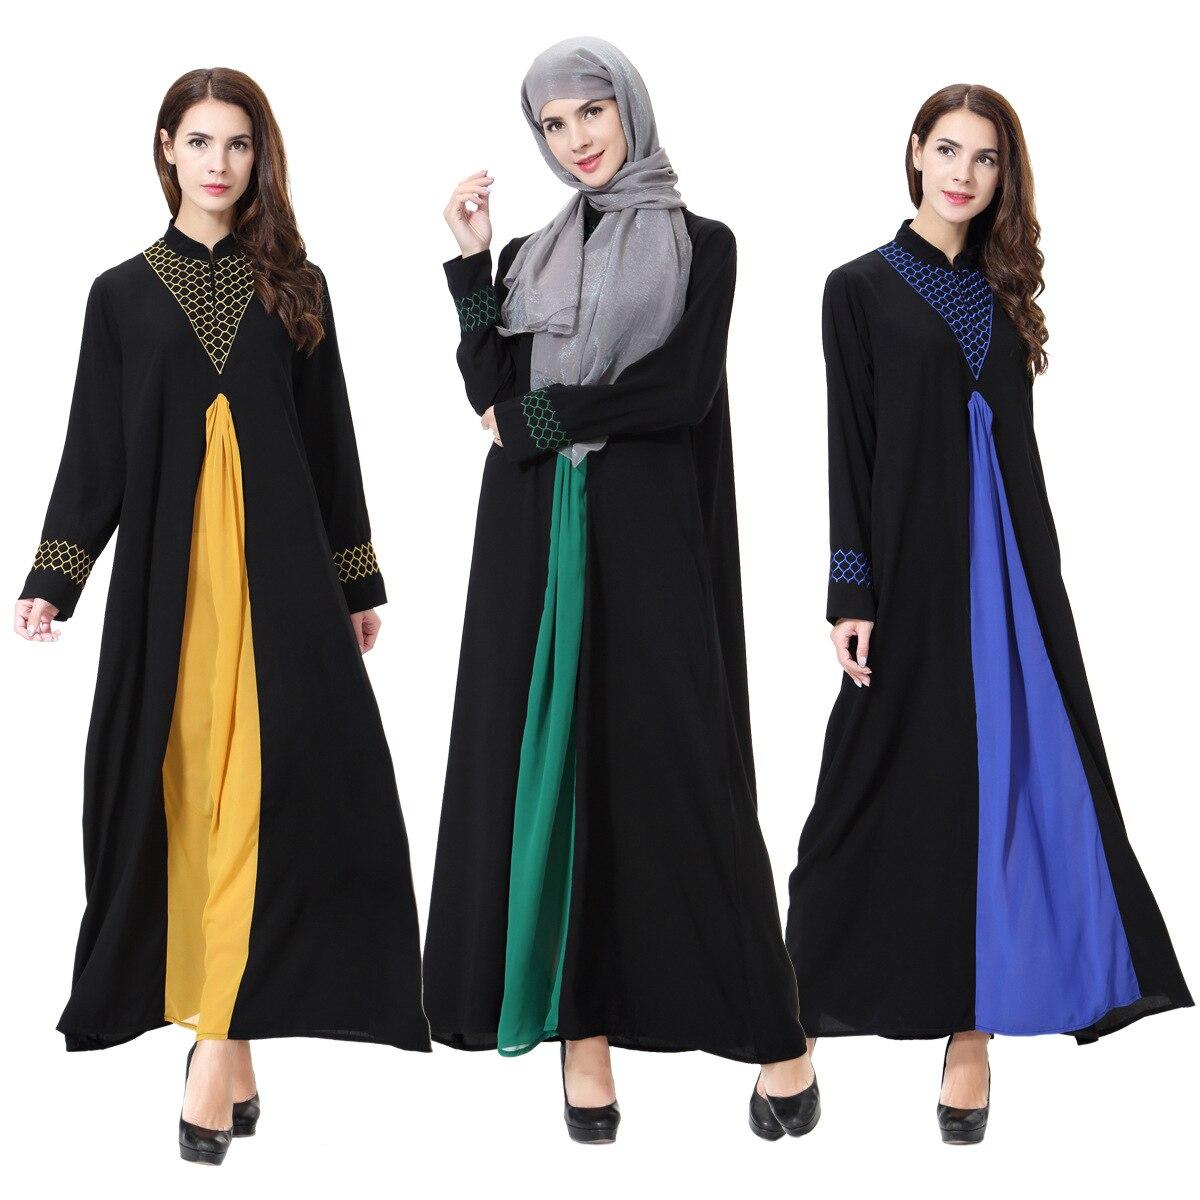 Vestidos de mujer musulmana patchwork árabe Abaya Dubai elegante Kaftan turco túnica femenina caftán ropa islámica vestido árabe TH901